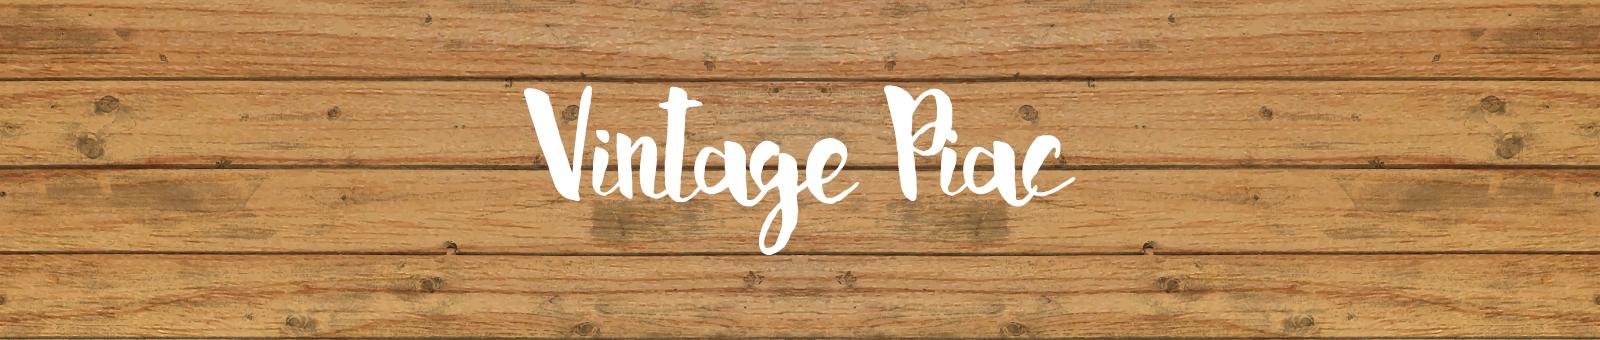 http://vintage-piac.hu/wp-tartalom/uploads/2016/03/vintage_piac_kep.jpg